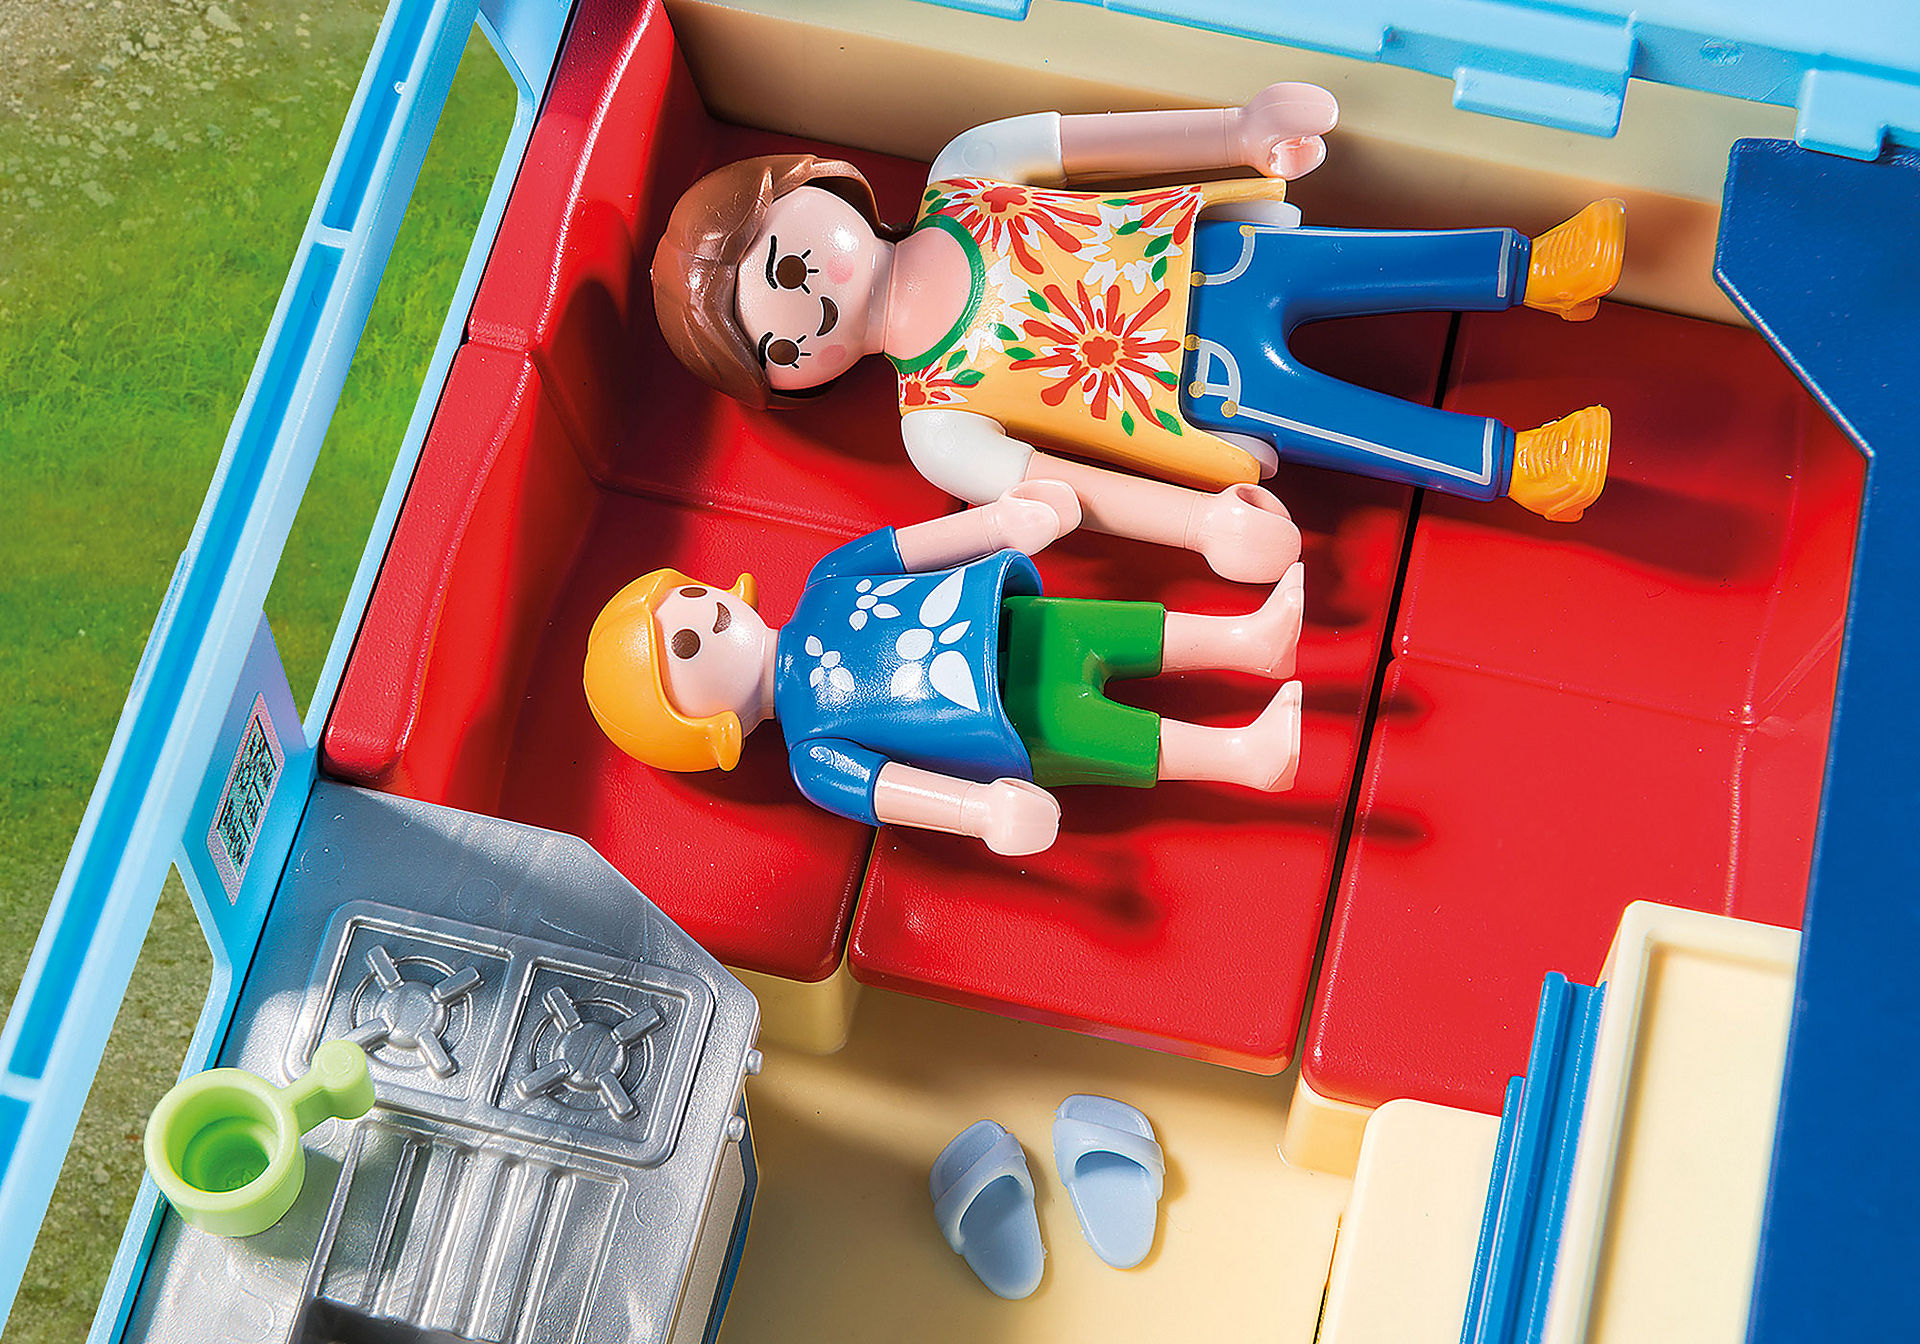 9502 Playmobil-Pick-Up mit Wohnwagen zoom image6